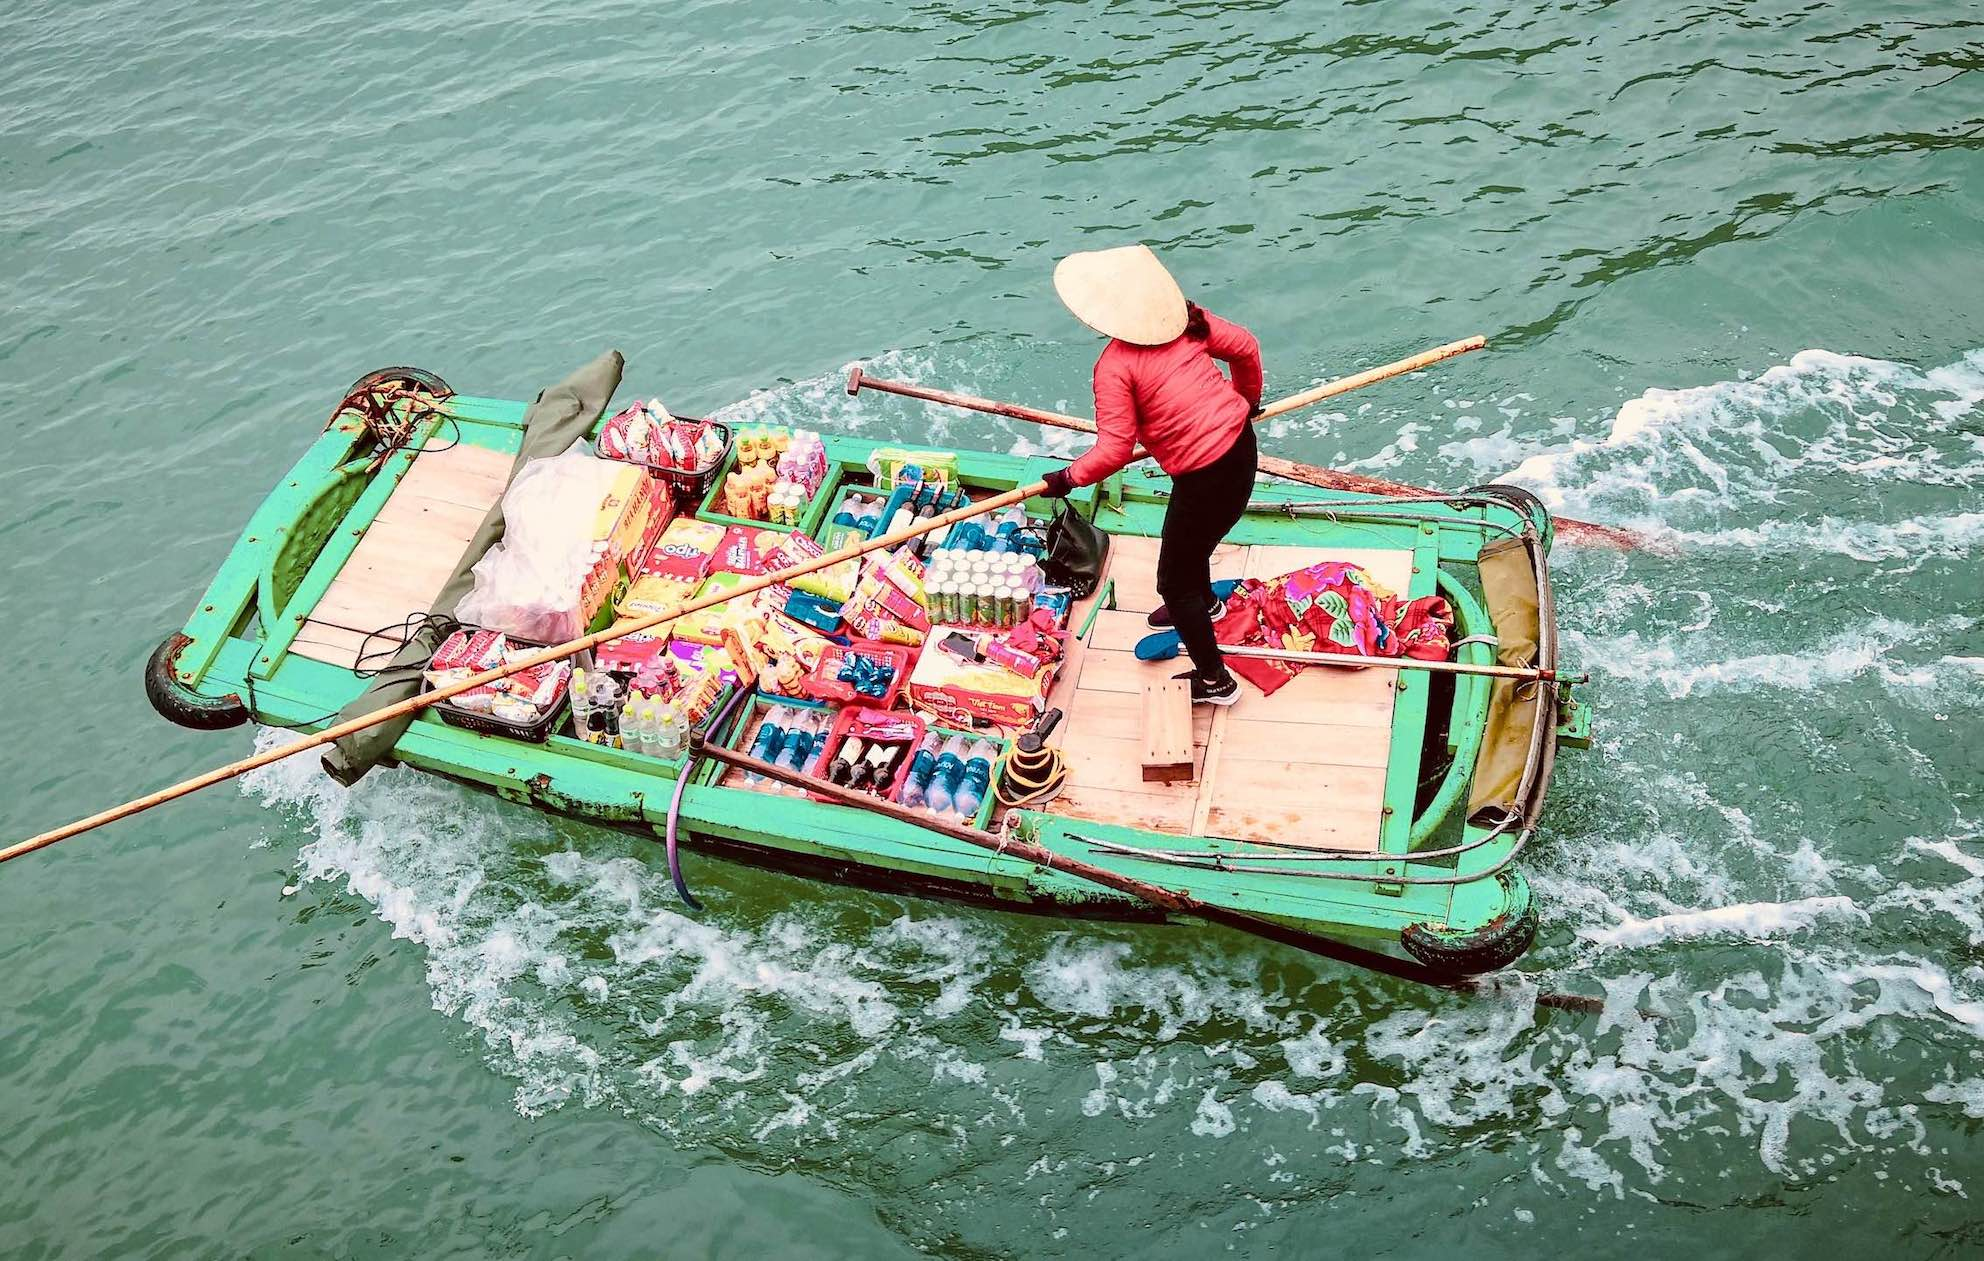 Floating store Lan Ha Bay Vietnam.